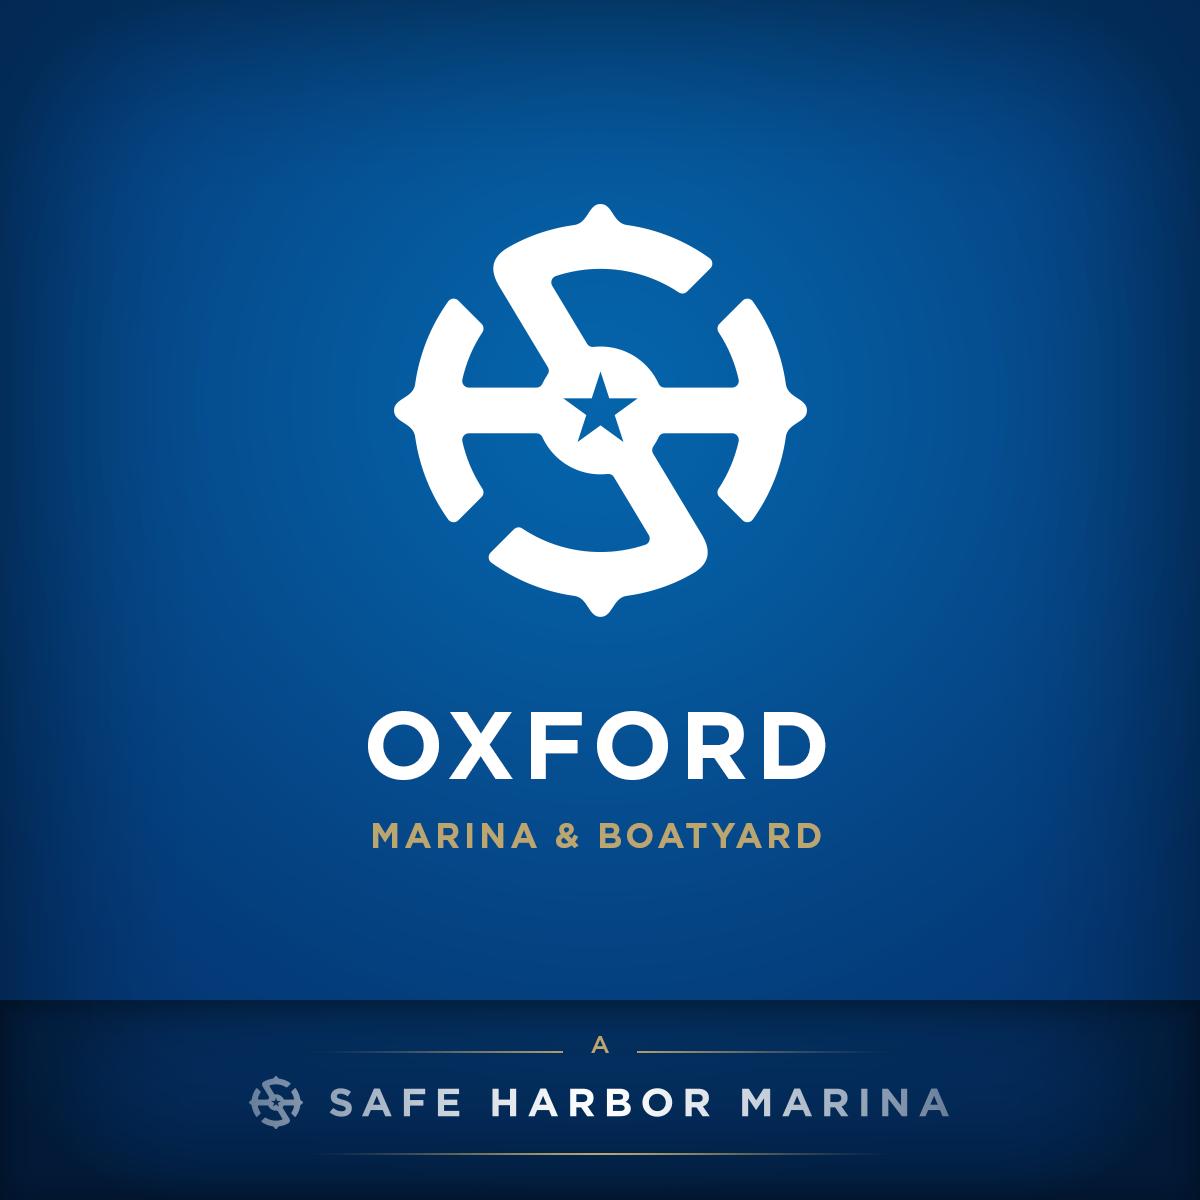 shm-fb-profile-1200x1200-md-oxford-marina-boatyard